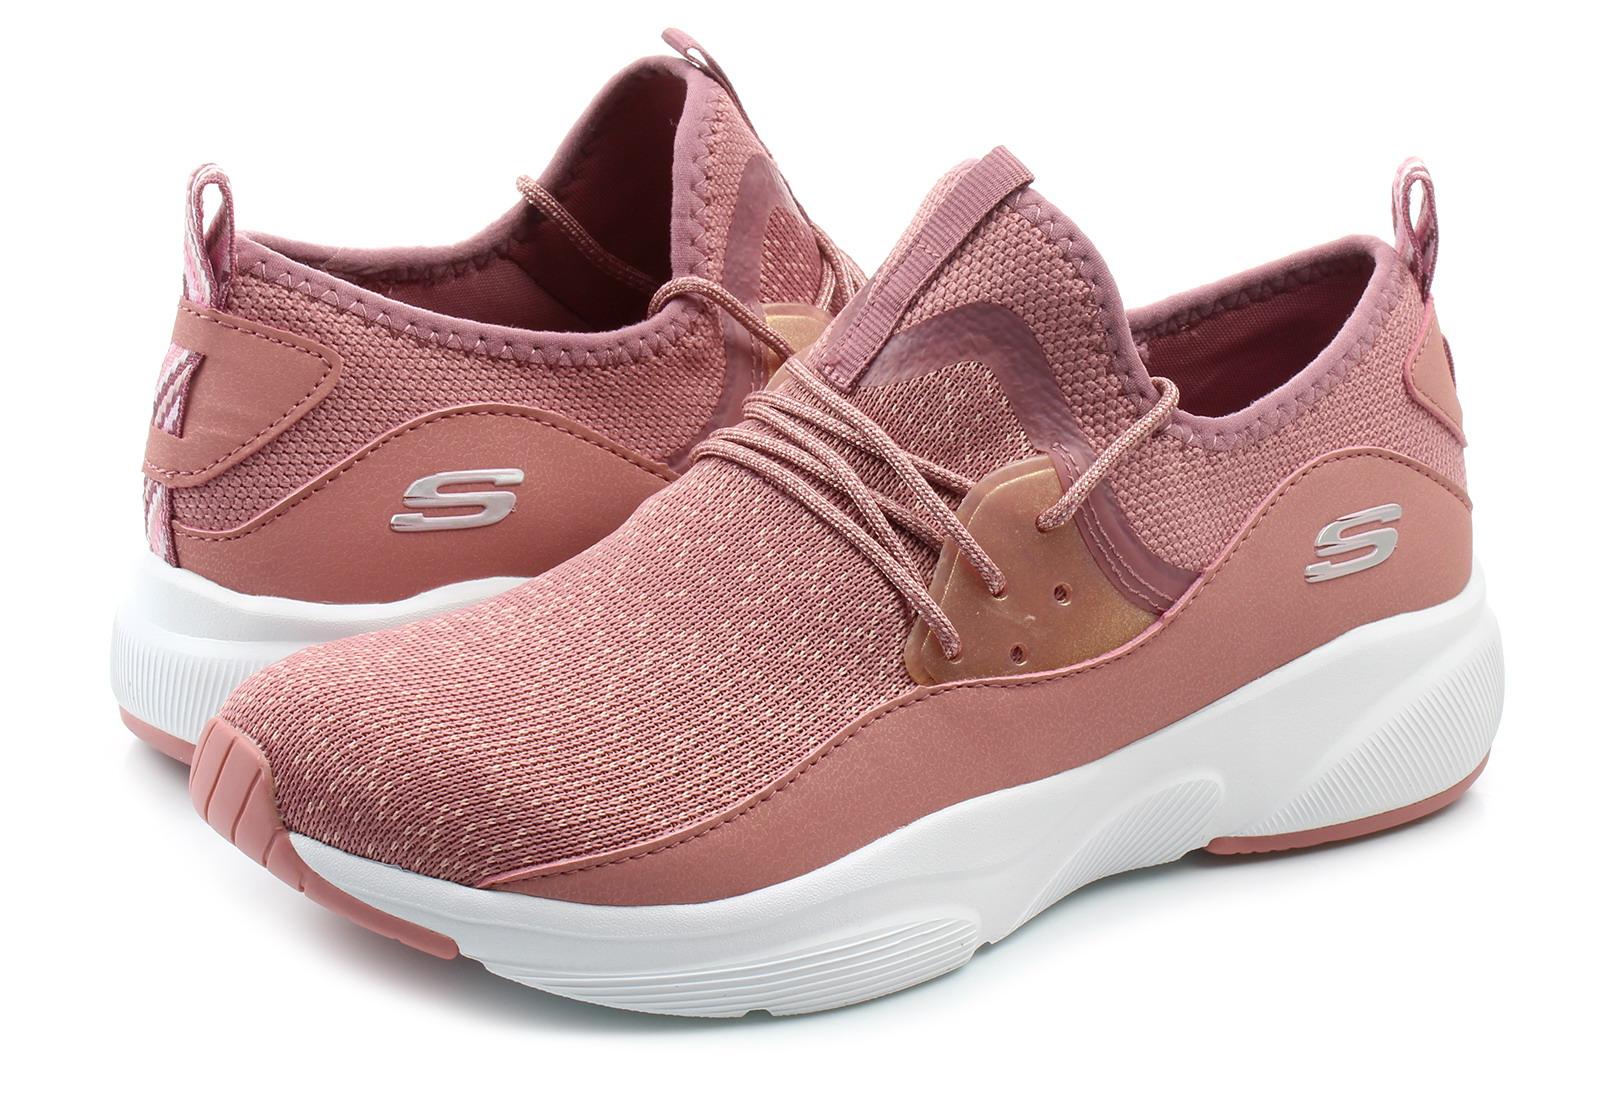 Skechers Shoes Meridian 13009 Ros Online Shop For